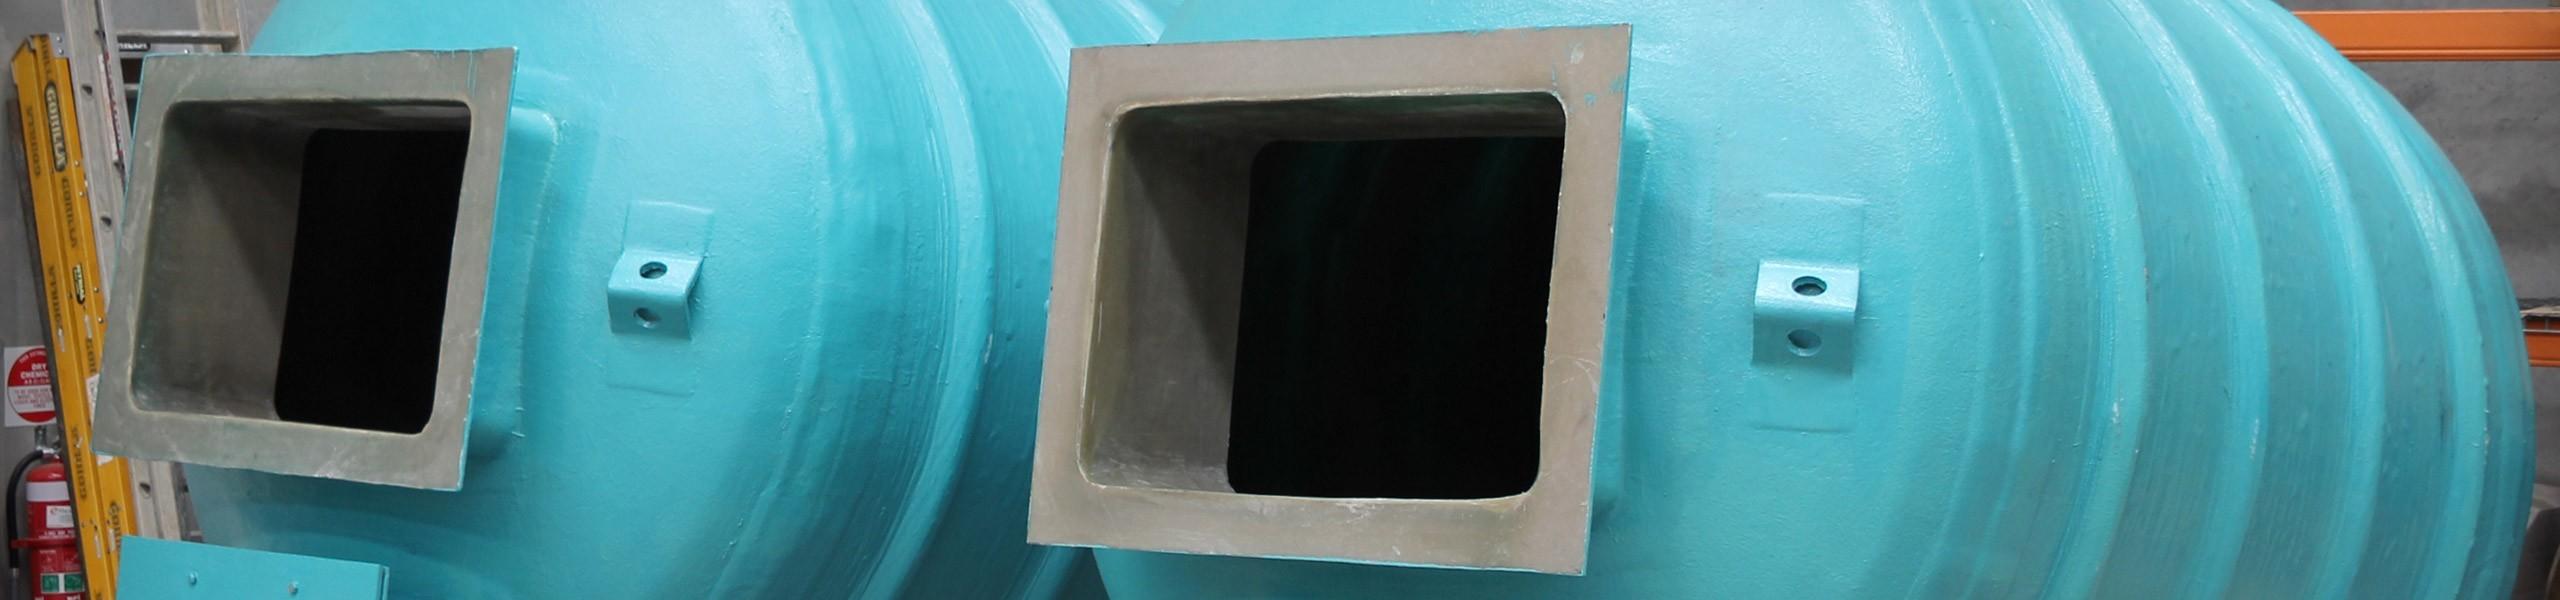 EnviroLift-fibreglasspps-banner.jpg